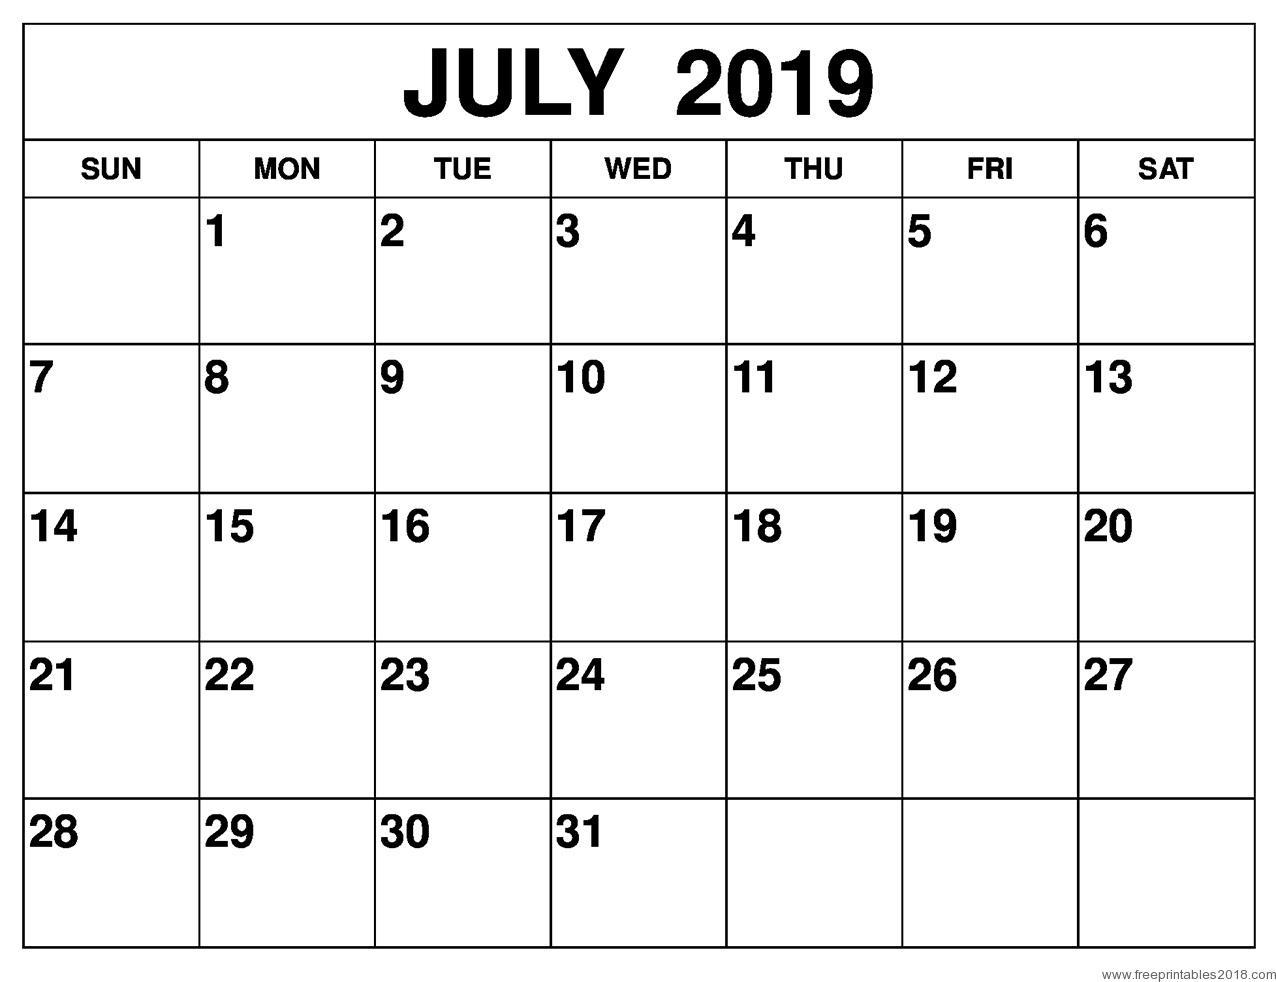 Calendar July 2019 - Free Printable Templates   Free Printables 2019 inside Calendar Printable Free Template